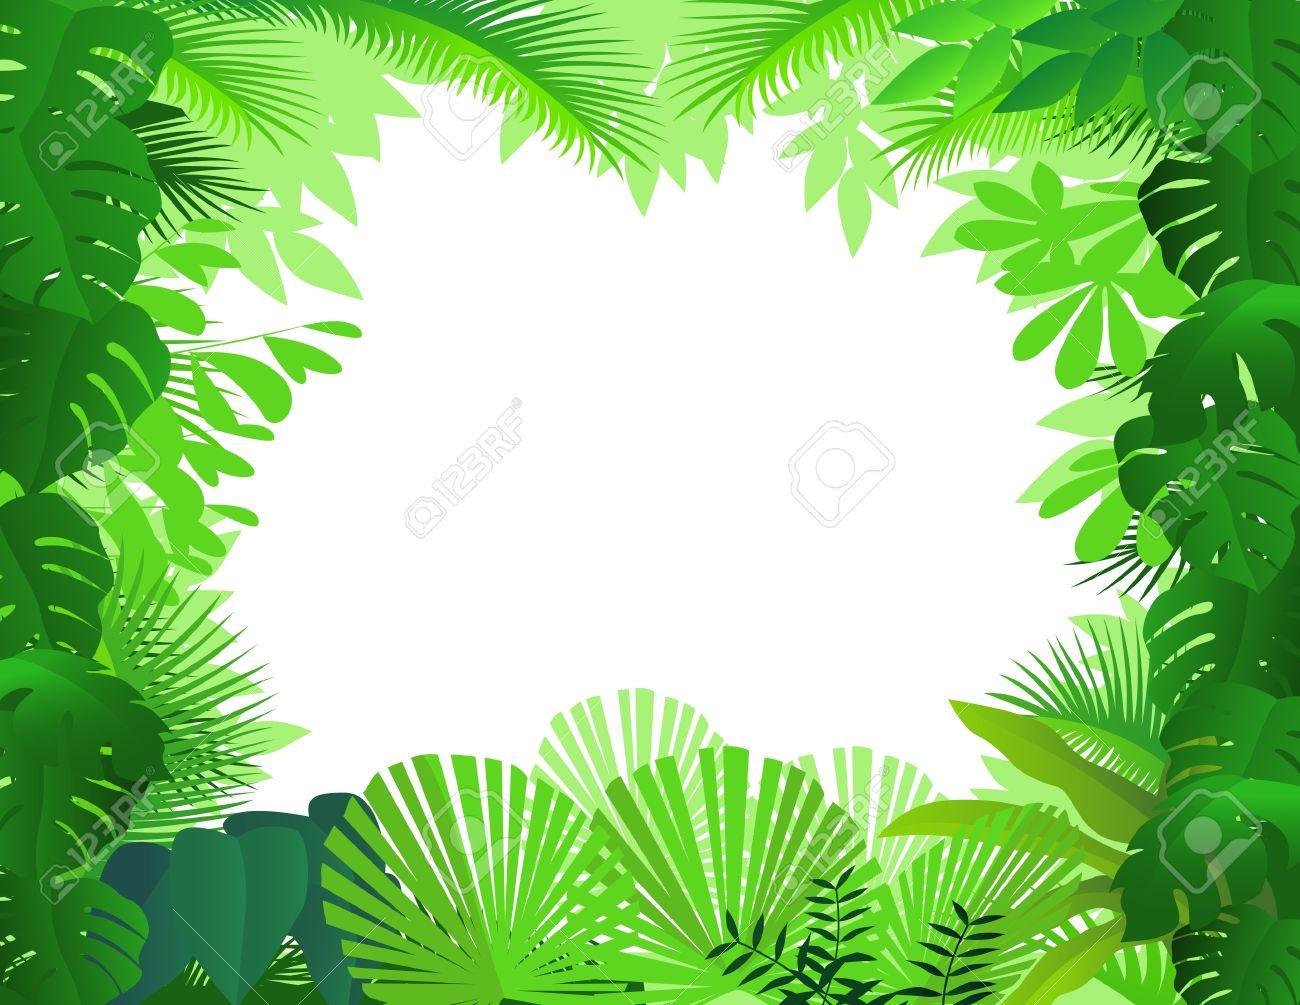 Jungle landscape background scene - Download Free Vectors, Clipart Graphics  & Vector Art